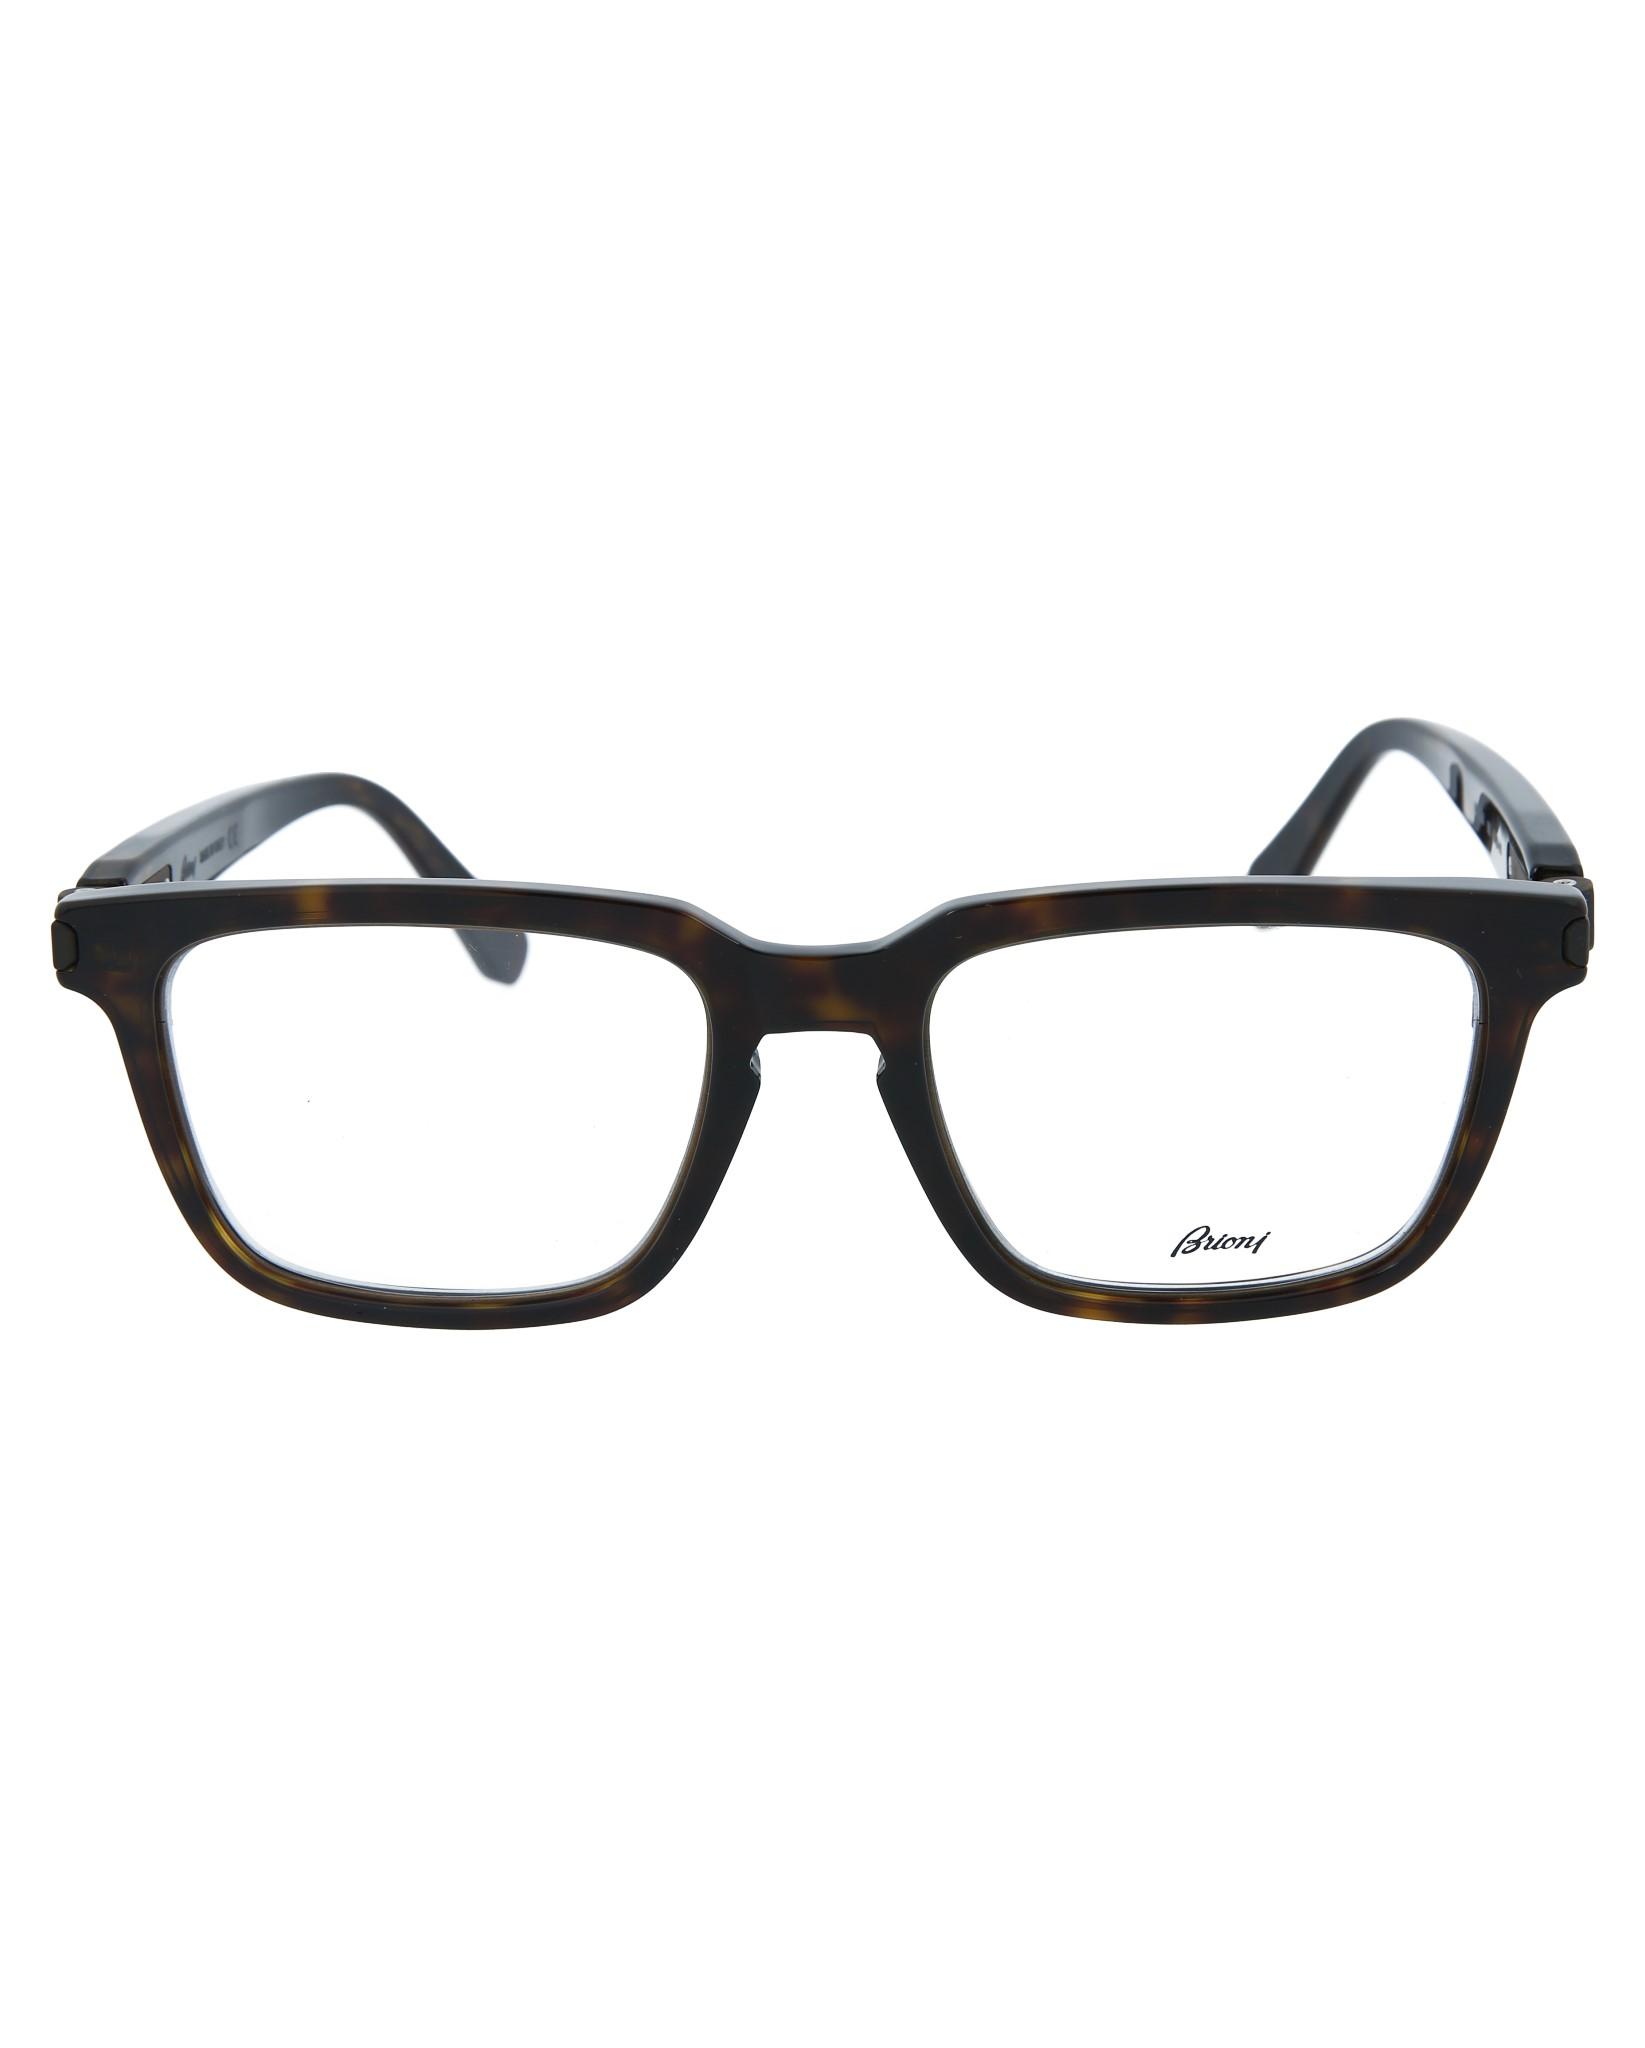 5bf46f54f7ac6 Brioni Mens Square Rectangle Optical Frames BR0002OA-30000203-002 ...